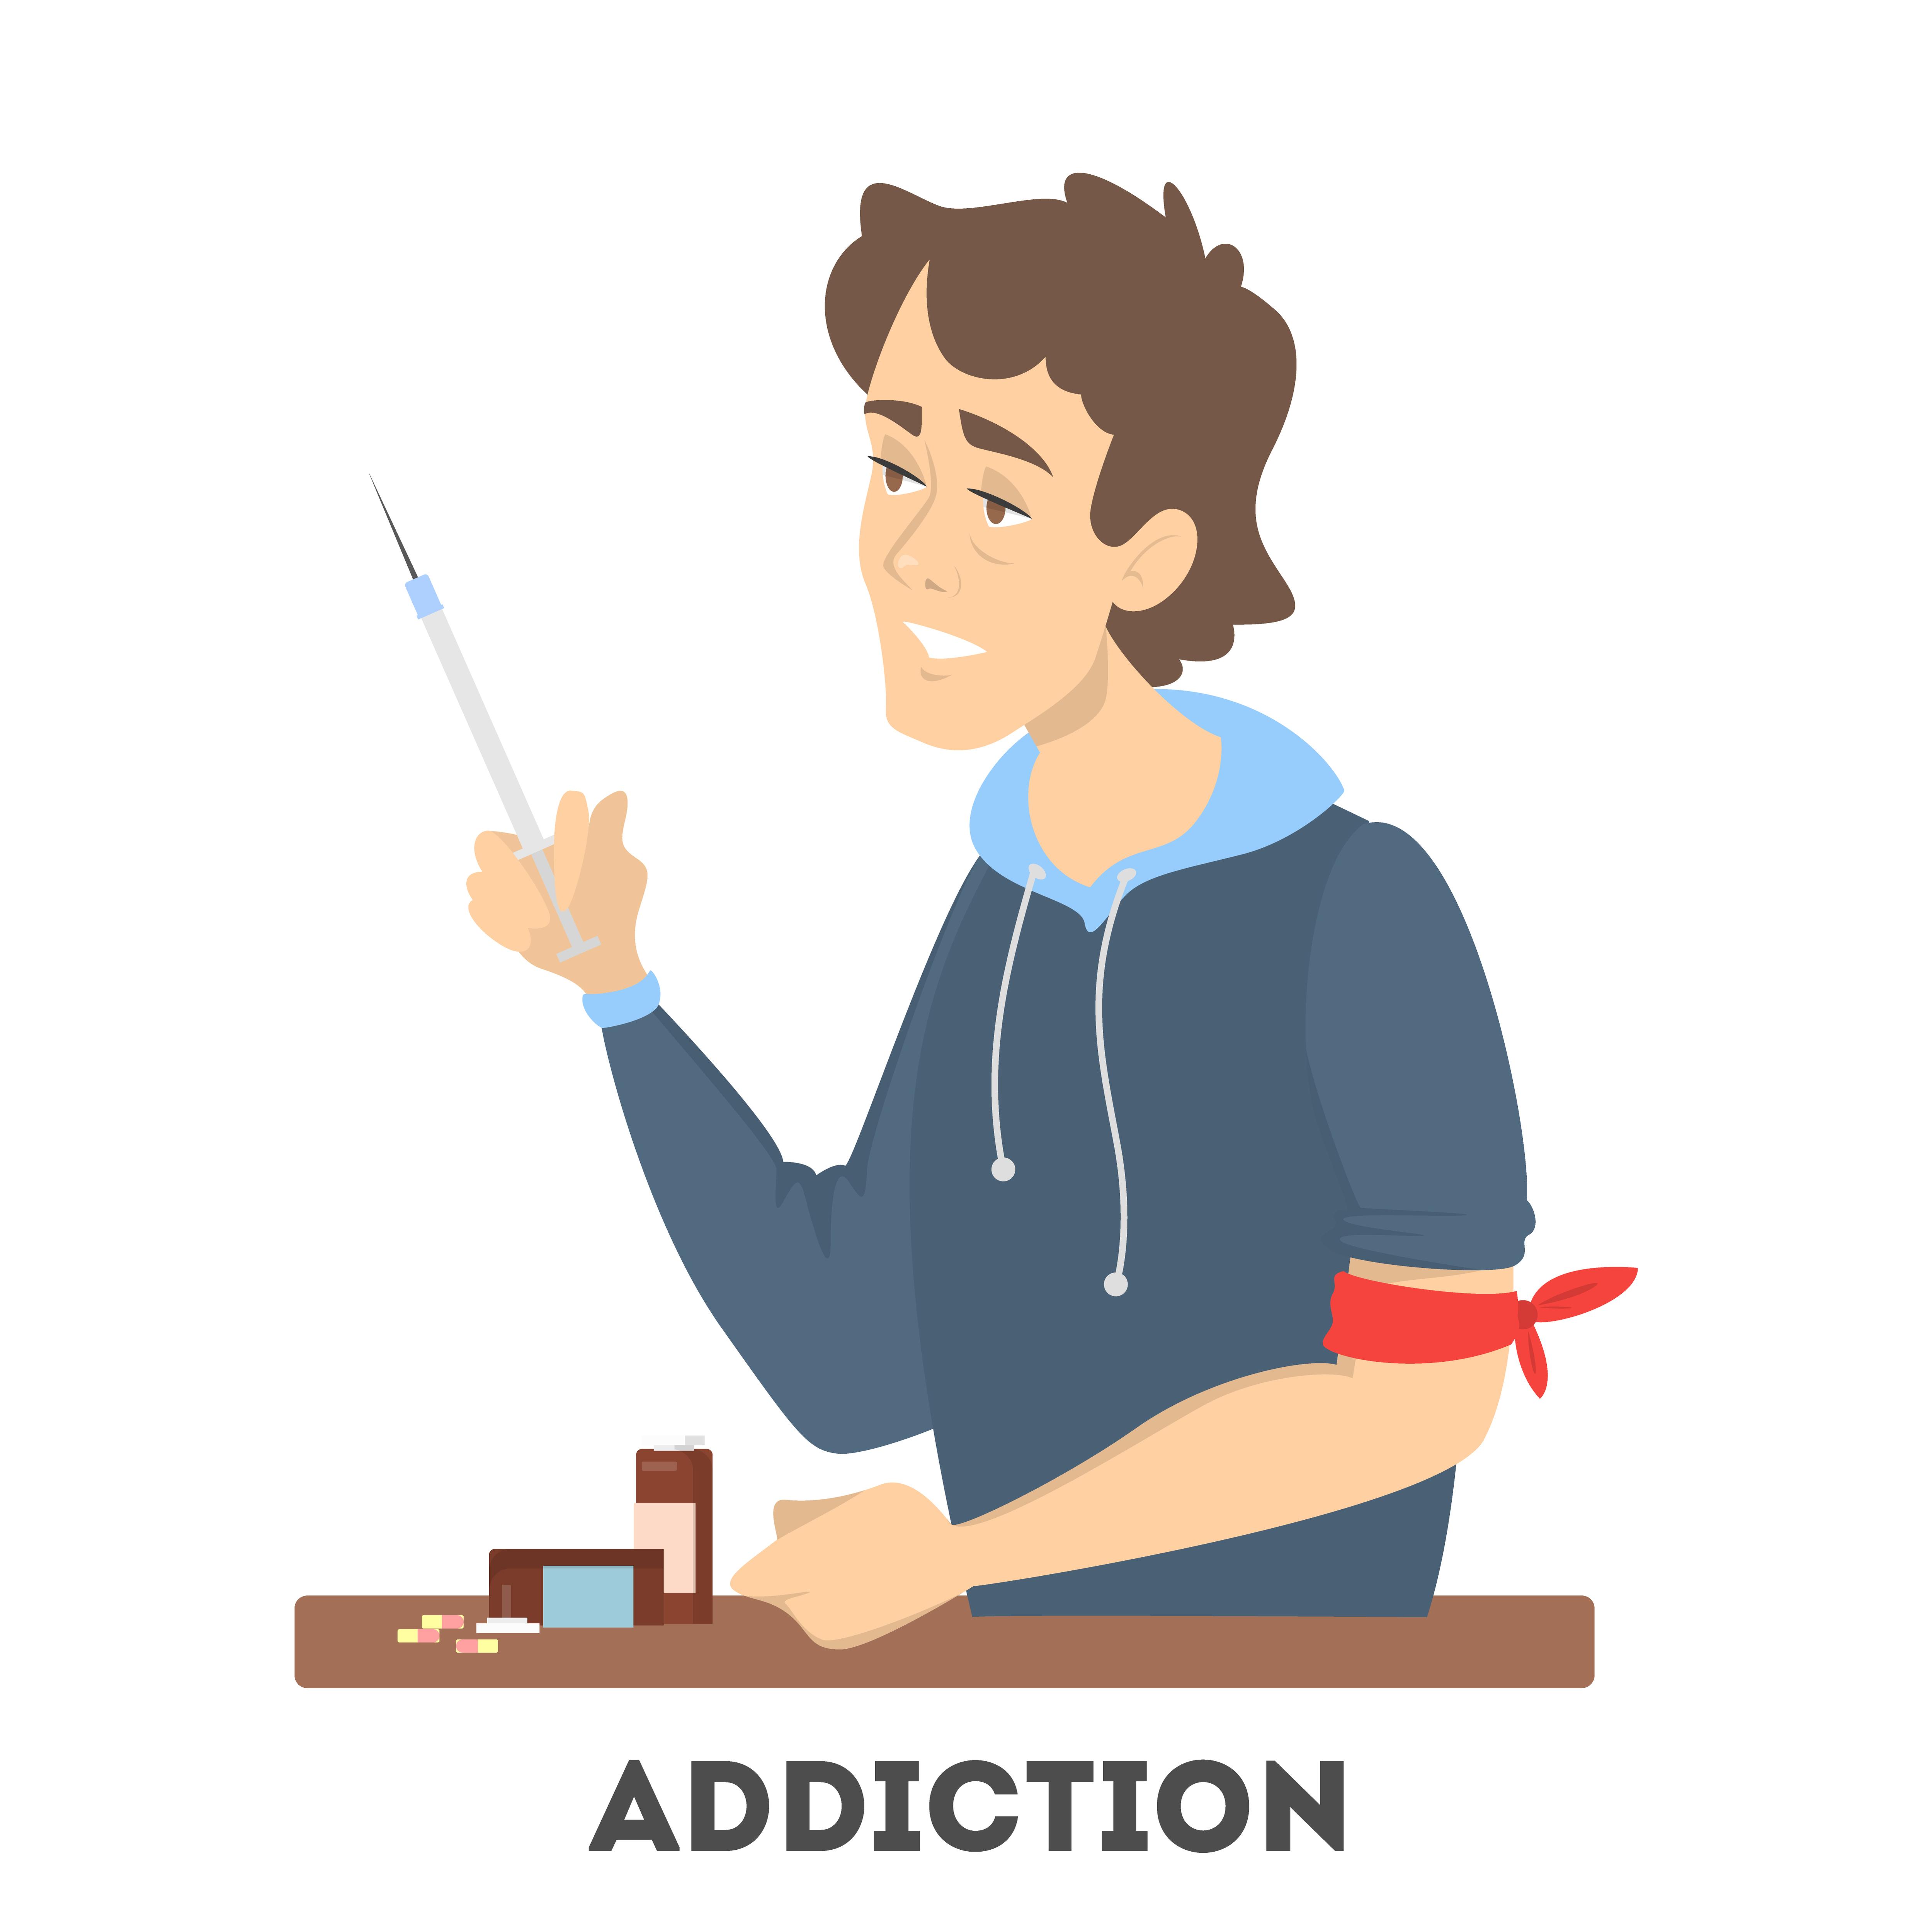 opioid abuse rehabilitation services